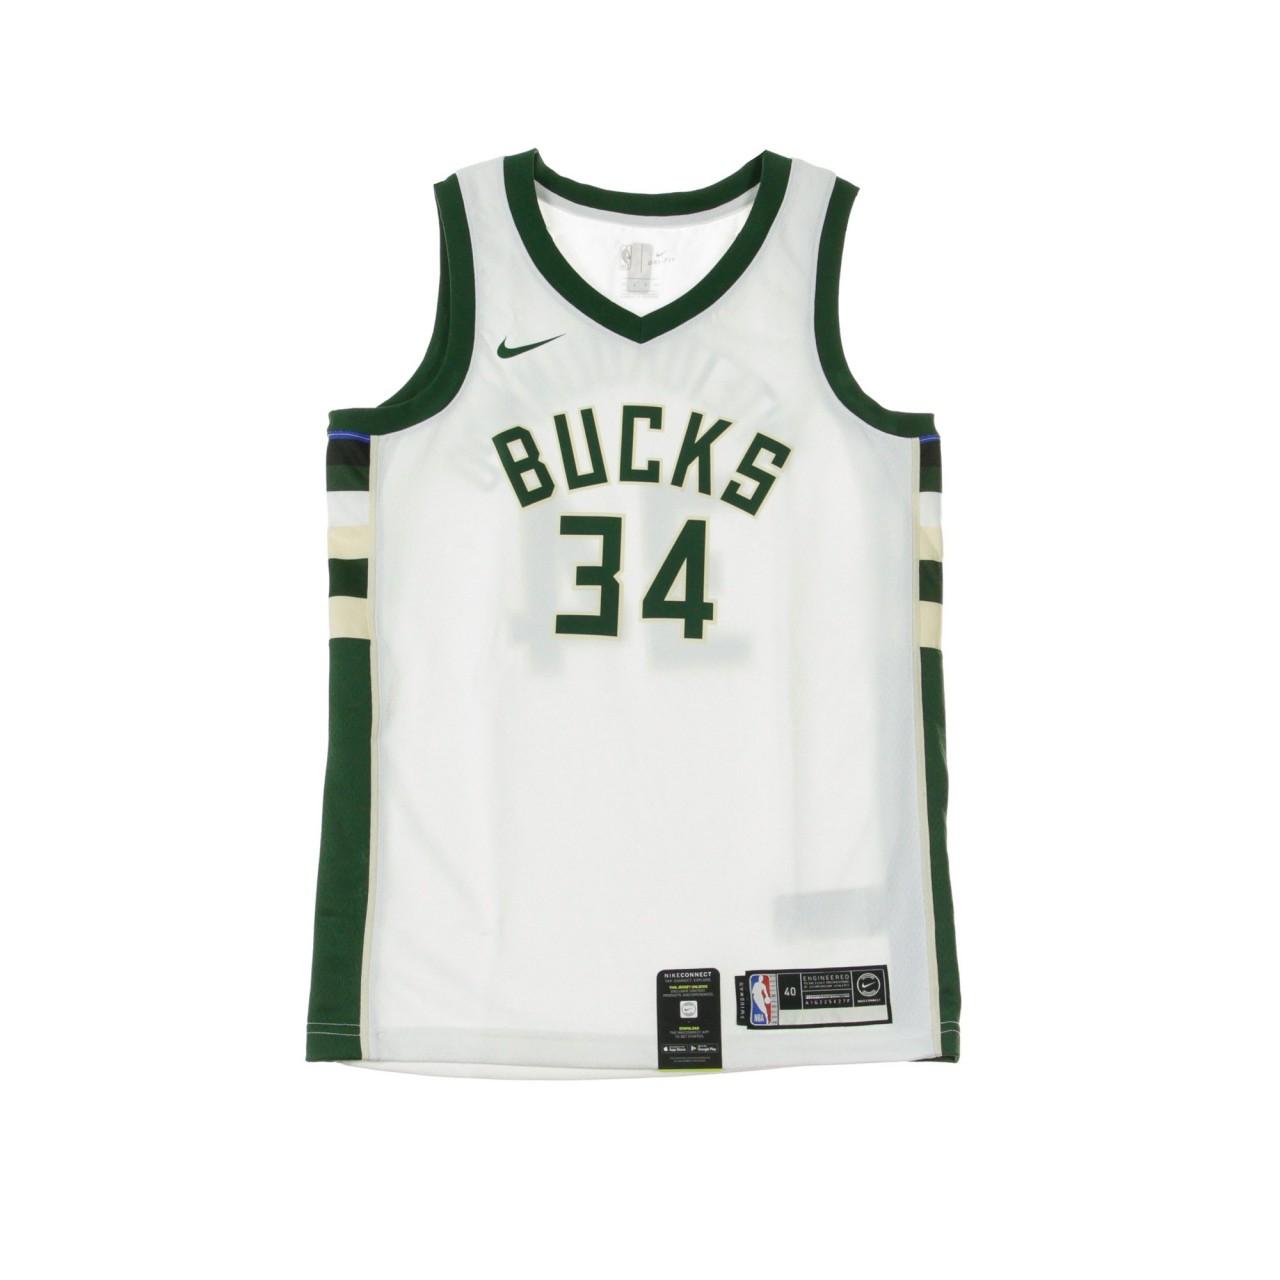 NIKE NBA NBA SWINGMAN JERSEY ASSOCIATION EDITION NO 34 GIANNIS ANTETOKOUNMPO MILBUC HOME 864429